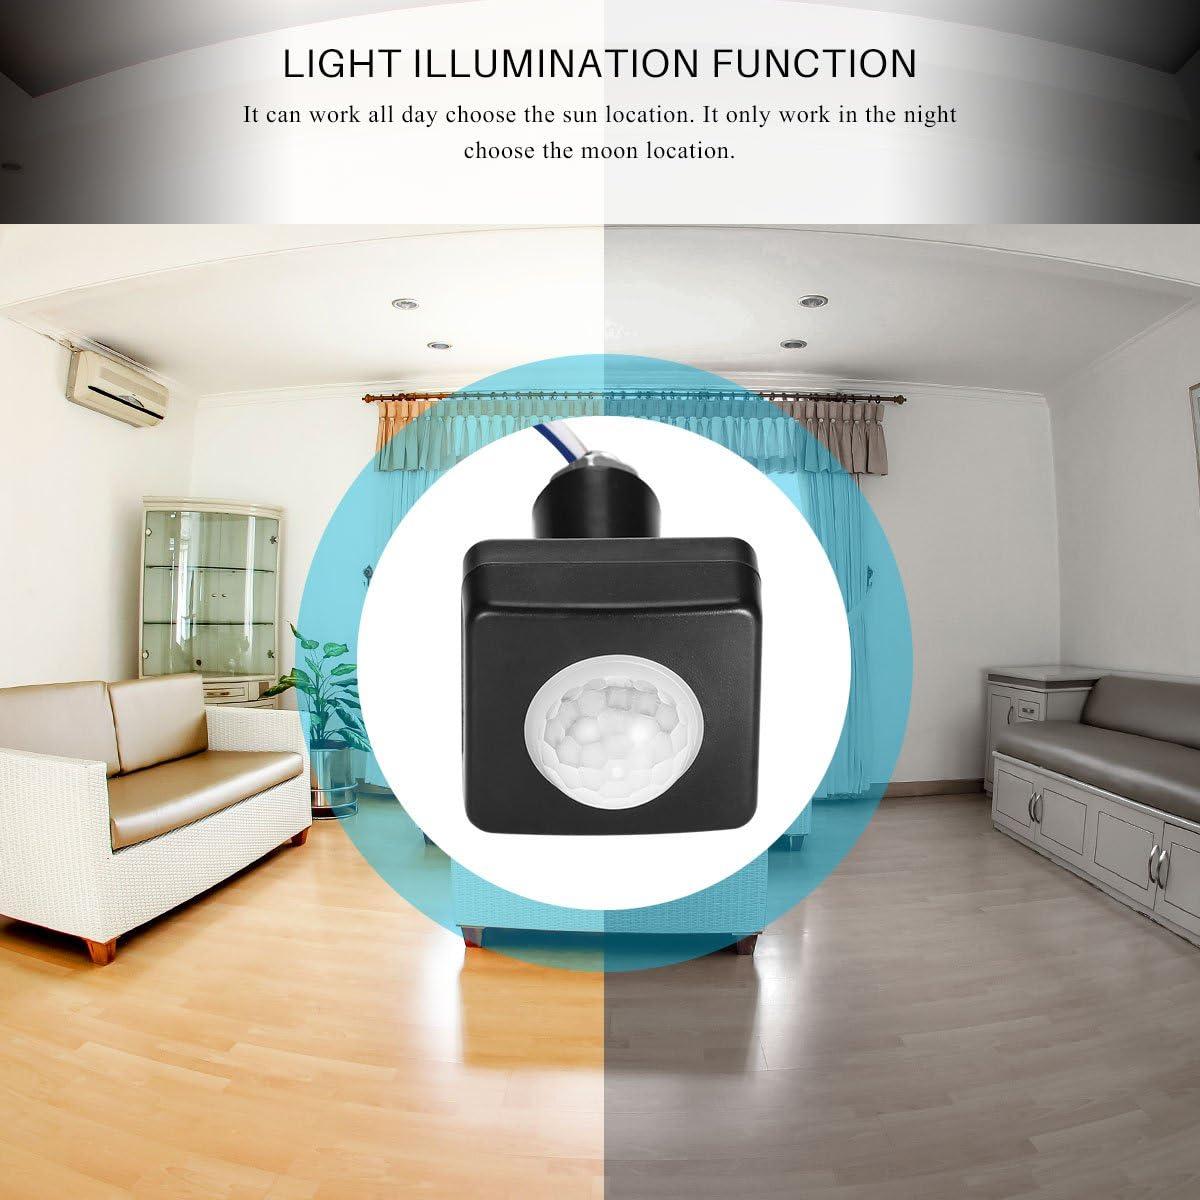 FreeLeben PIR Motion Sensor Switch Built-in 3 Adjustable Switches 180 Degree Sensing Range Maximum Distance of 26.2 Feet IP54 Waterproof